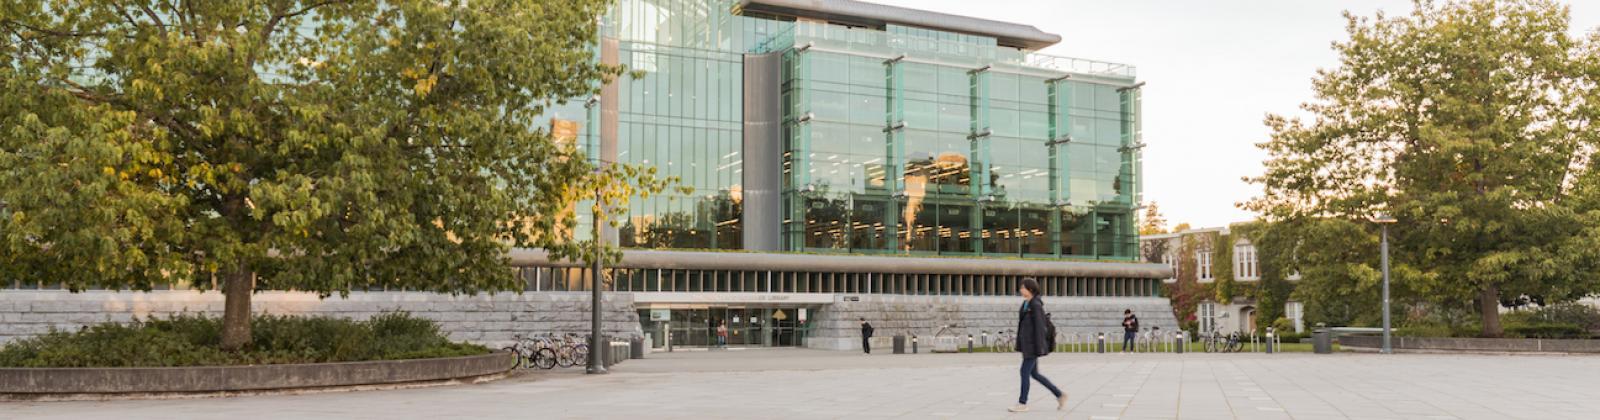 Walking past the Koerner Library